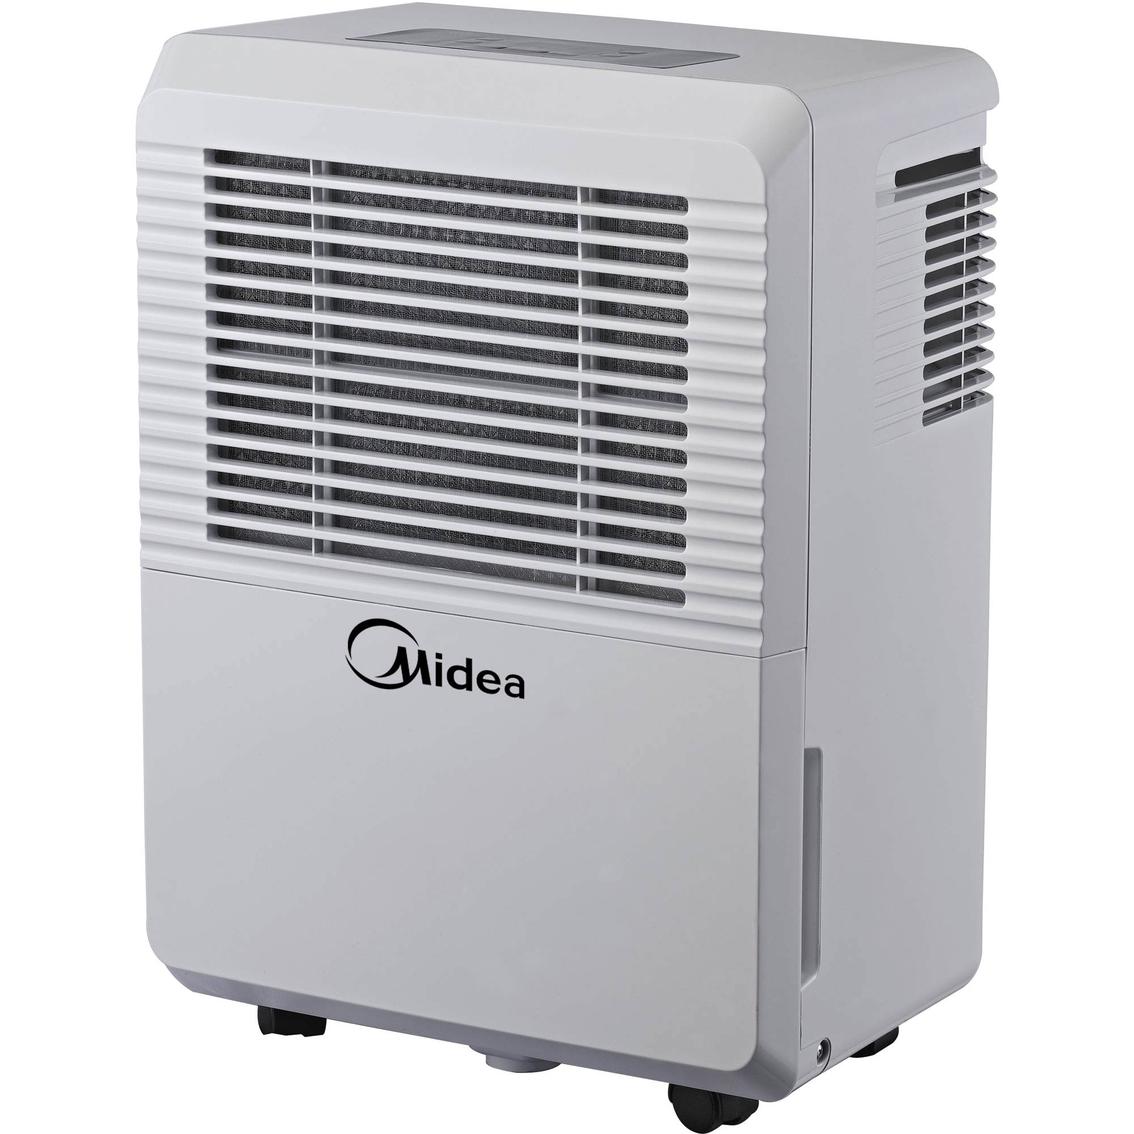 Midea 60 Pt. Dehumidifier Humidifiers & Dehumidifiers Home  #61646A